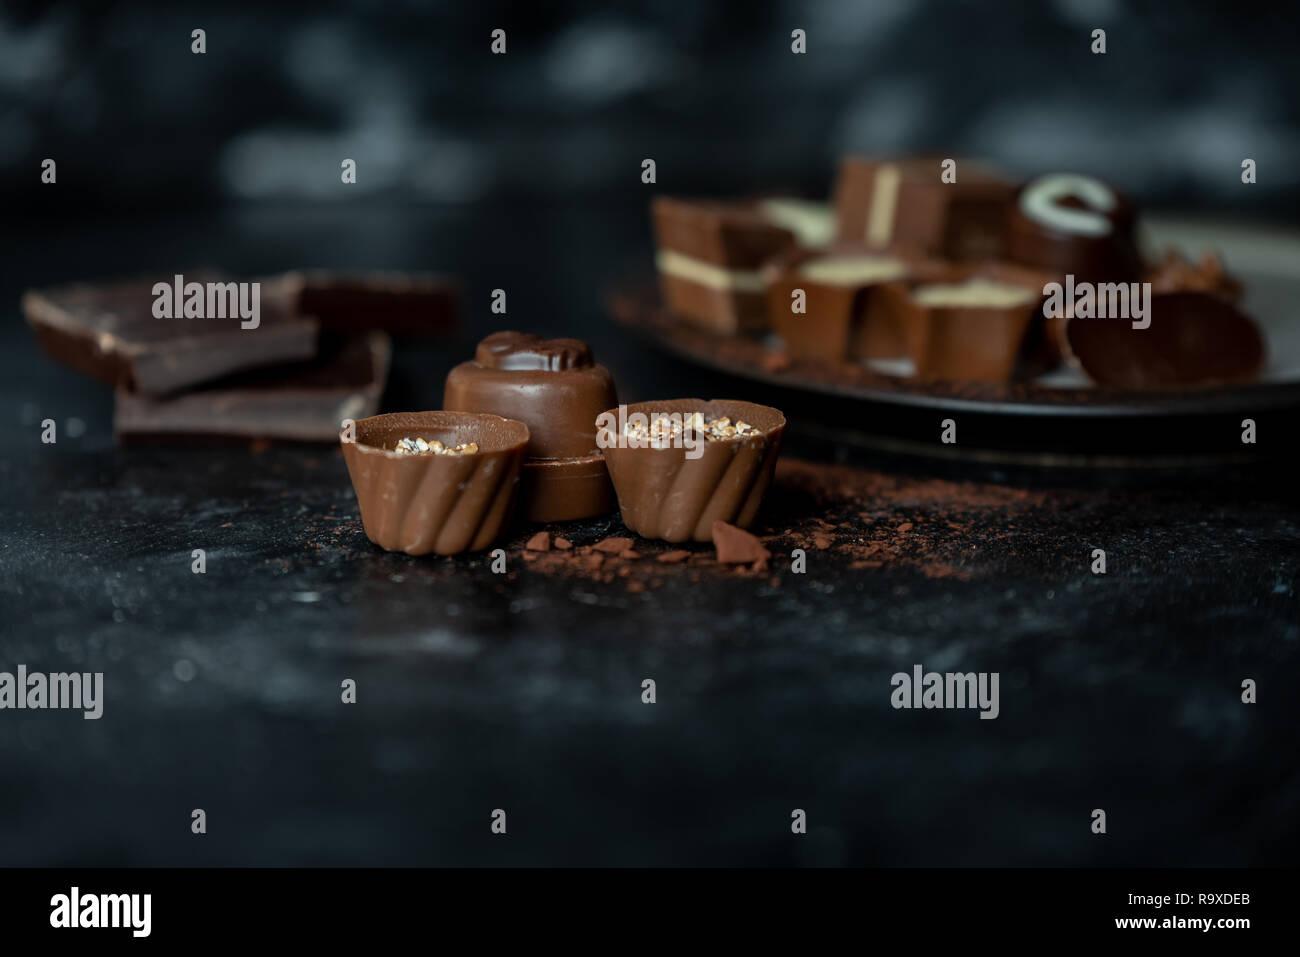 Diferentes pralines, dulce de leche, oscuro y chocolate blanco sobre un fondo oscuro, de madera Foto de stock